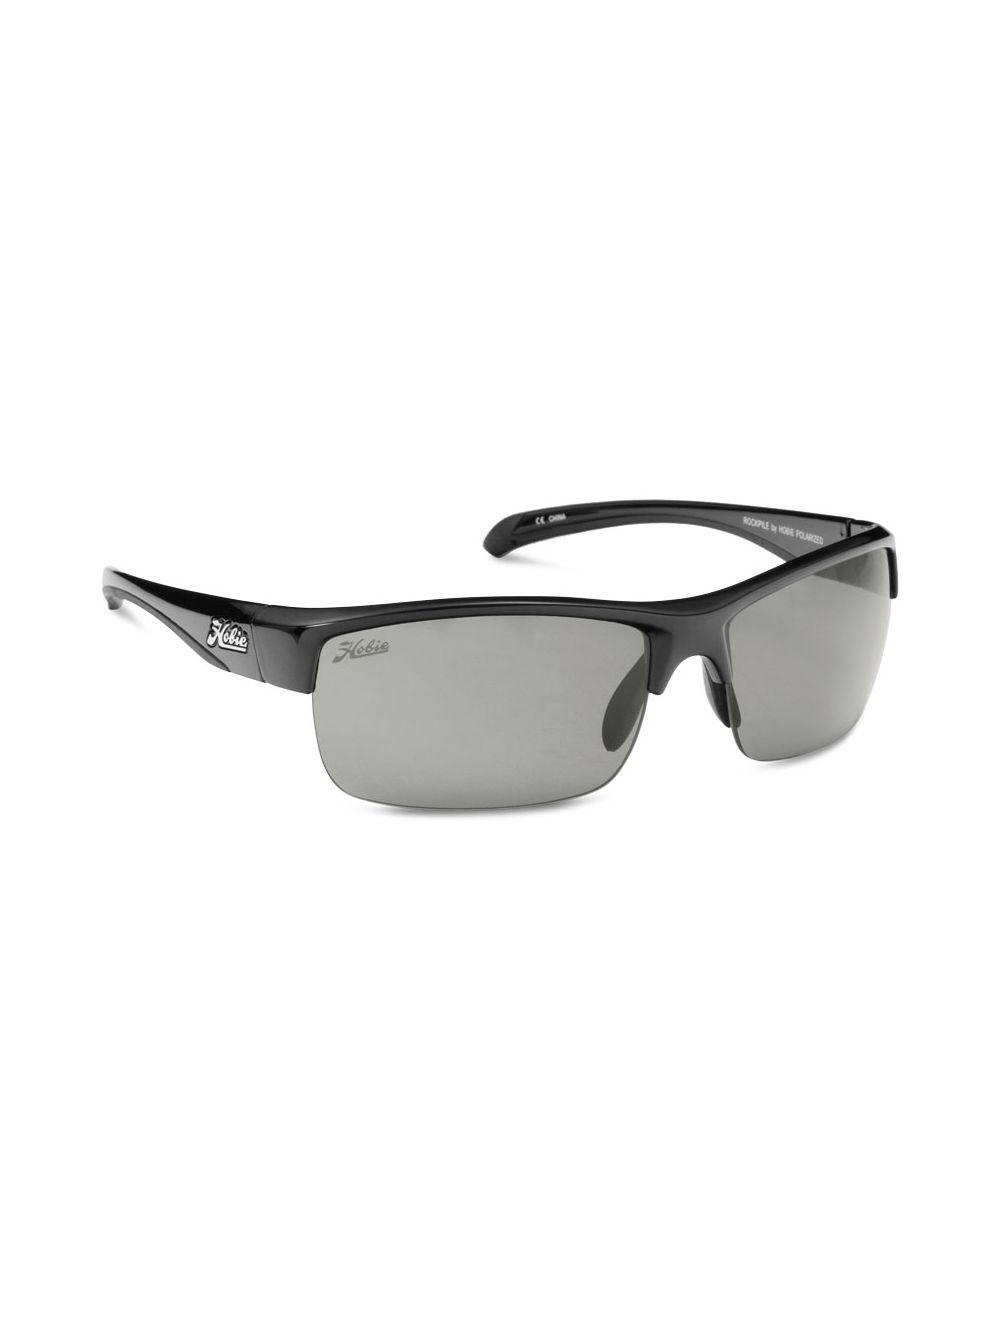 Rockpile Hydroclean Polycarbonate - Shiny Black / Grey